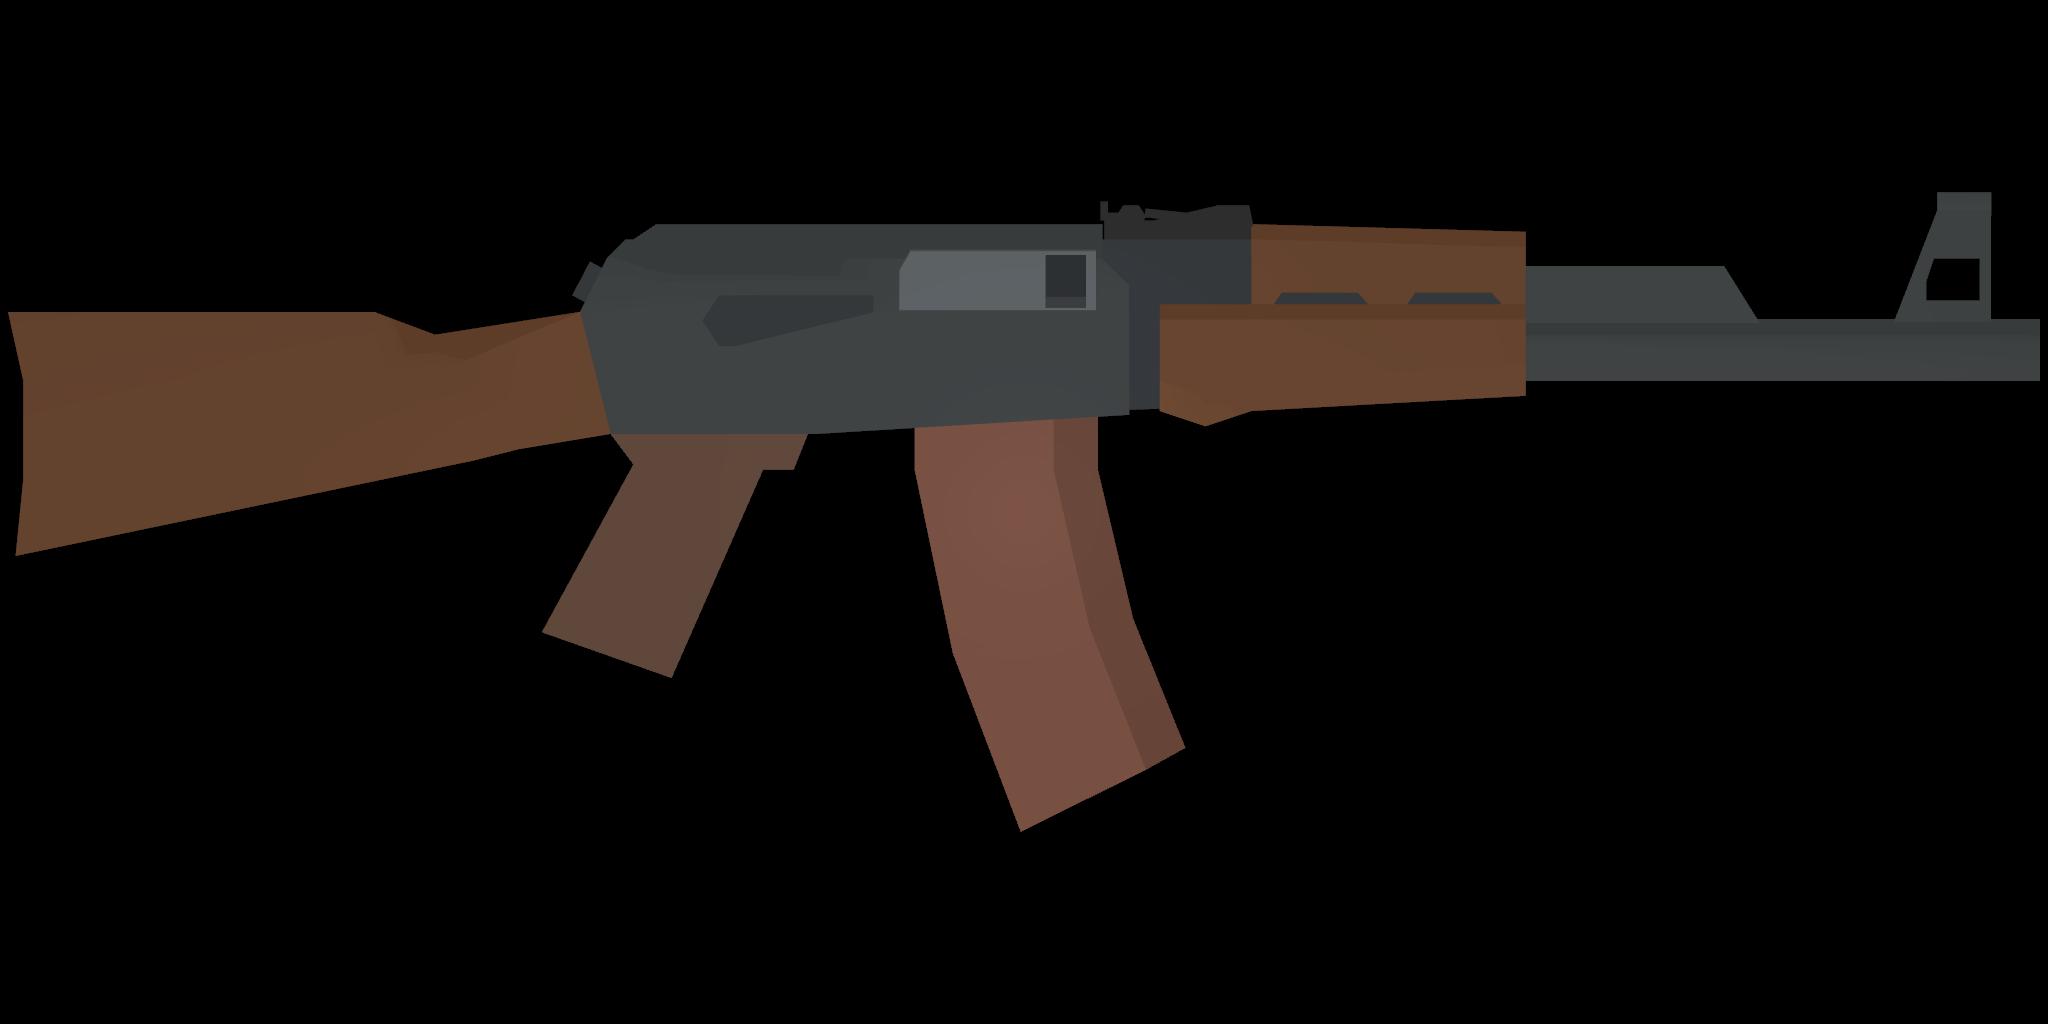 Unturned Uncreated Warfare Mods & All ID List + Attachments - Russian Weapons - F8F6FC4